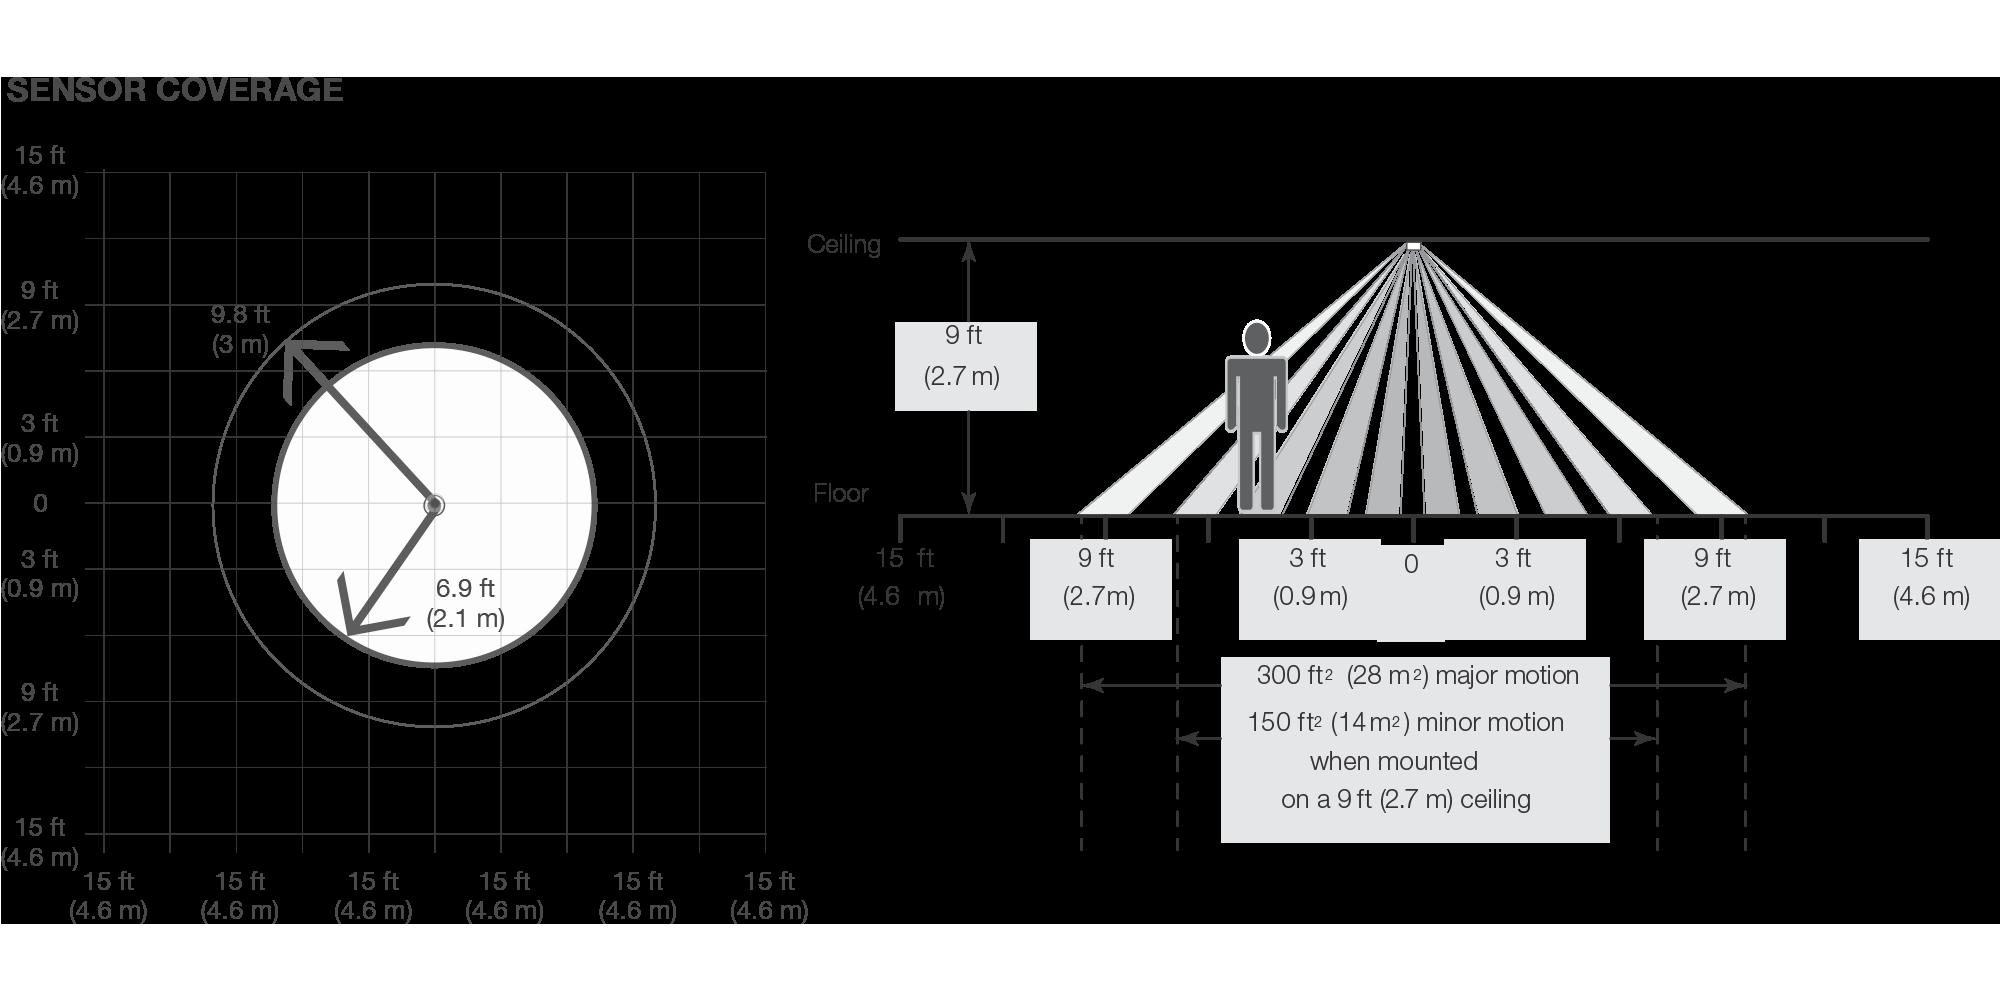 sensor coverage